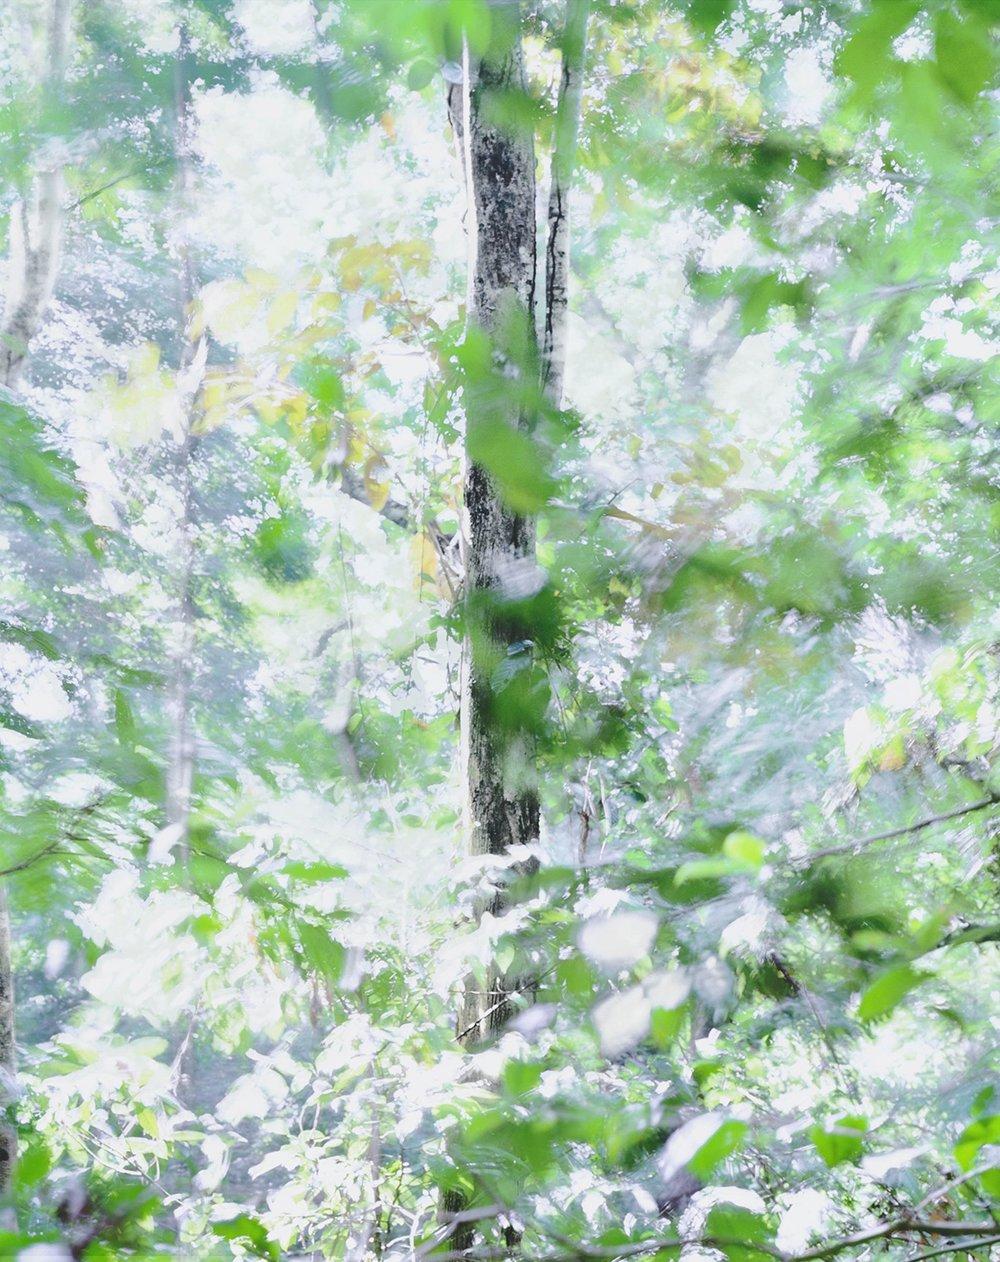 Respiro 06, 2017 37.5 x 30 in Vellum + Archival Inkjet Prints Overlaid